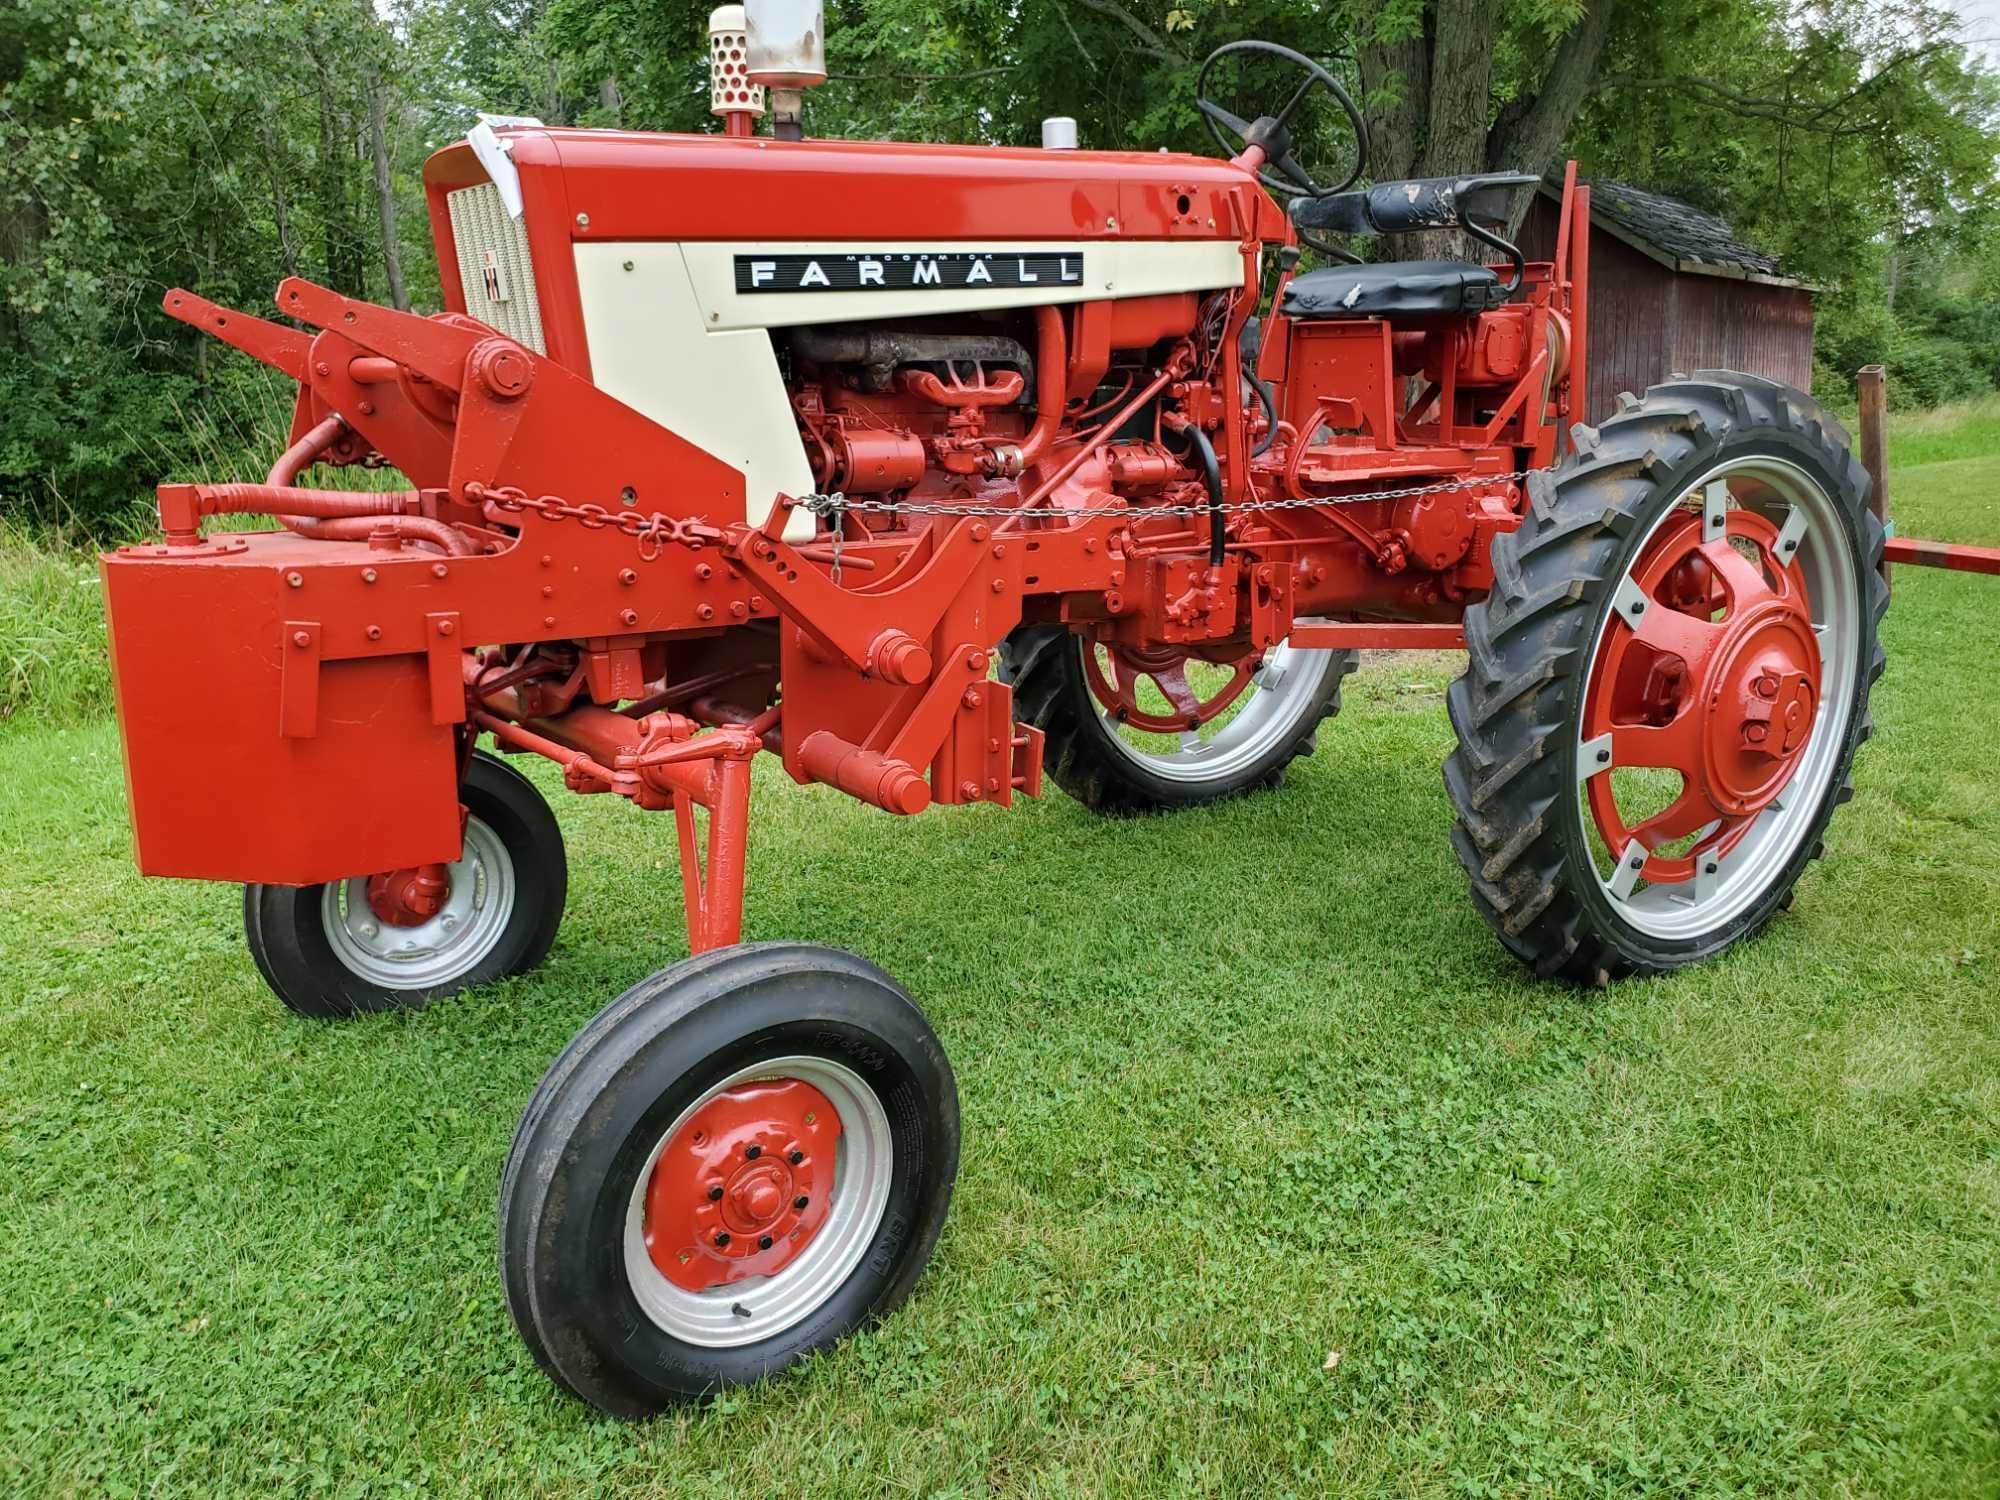 RandLeigh Farms and Equipment NetAuction